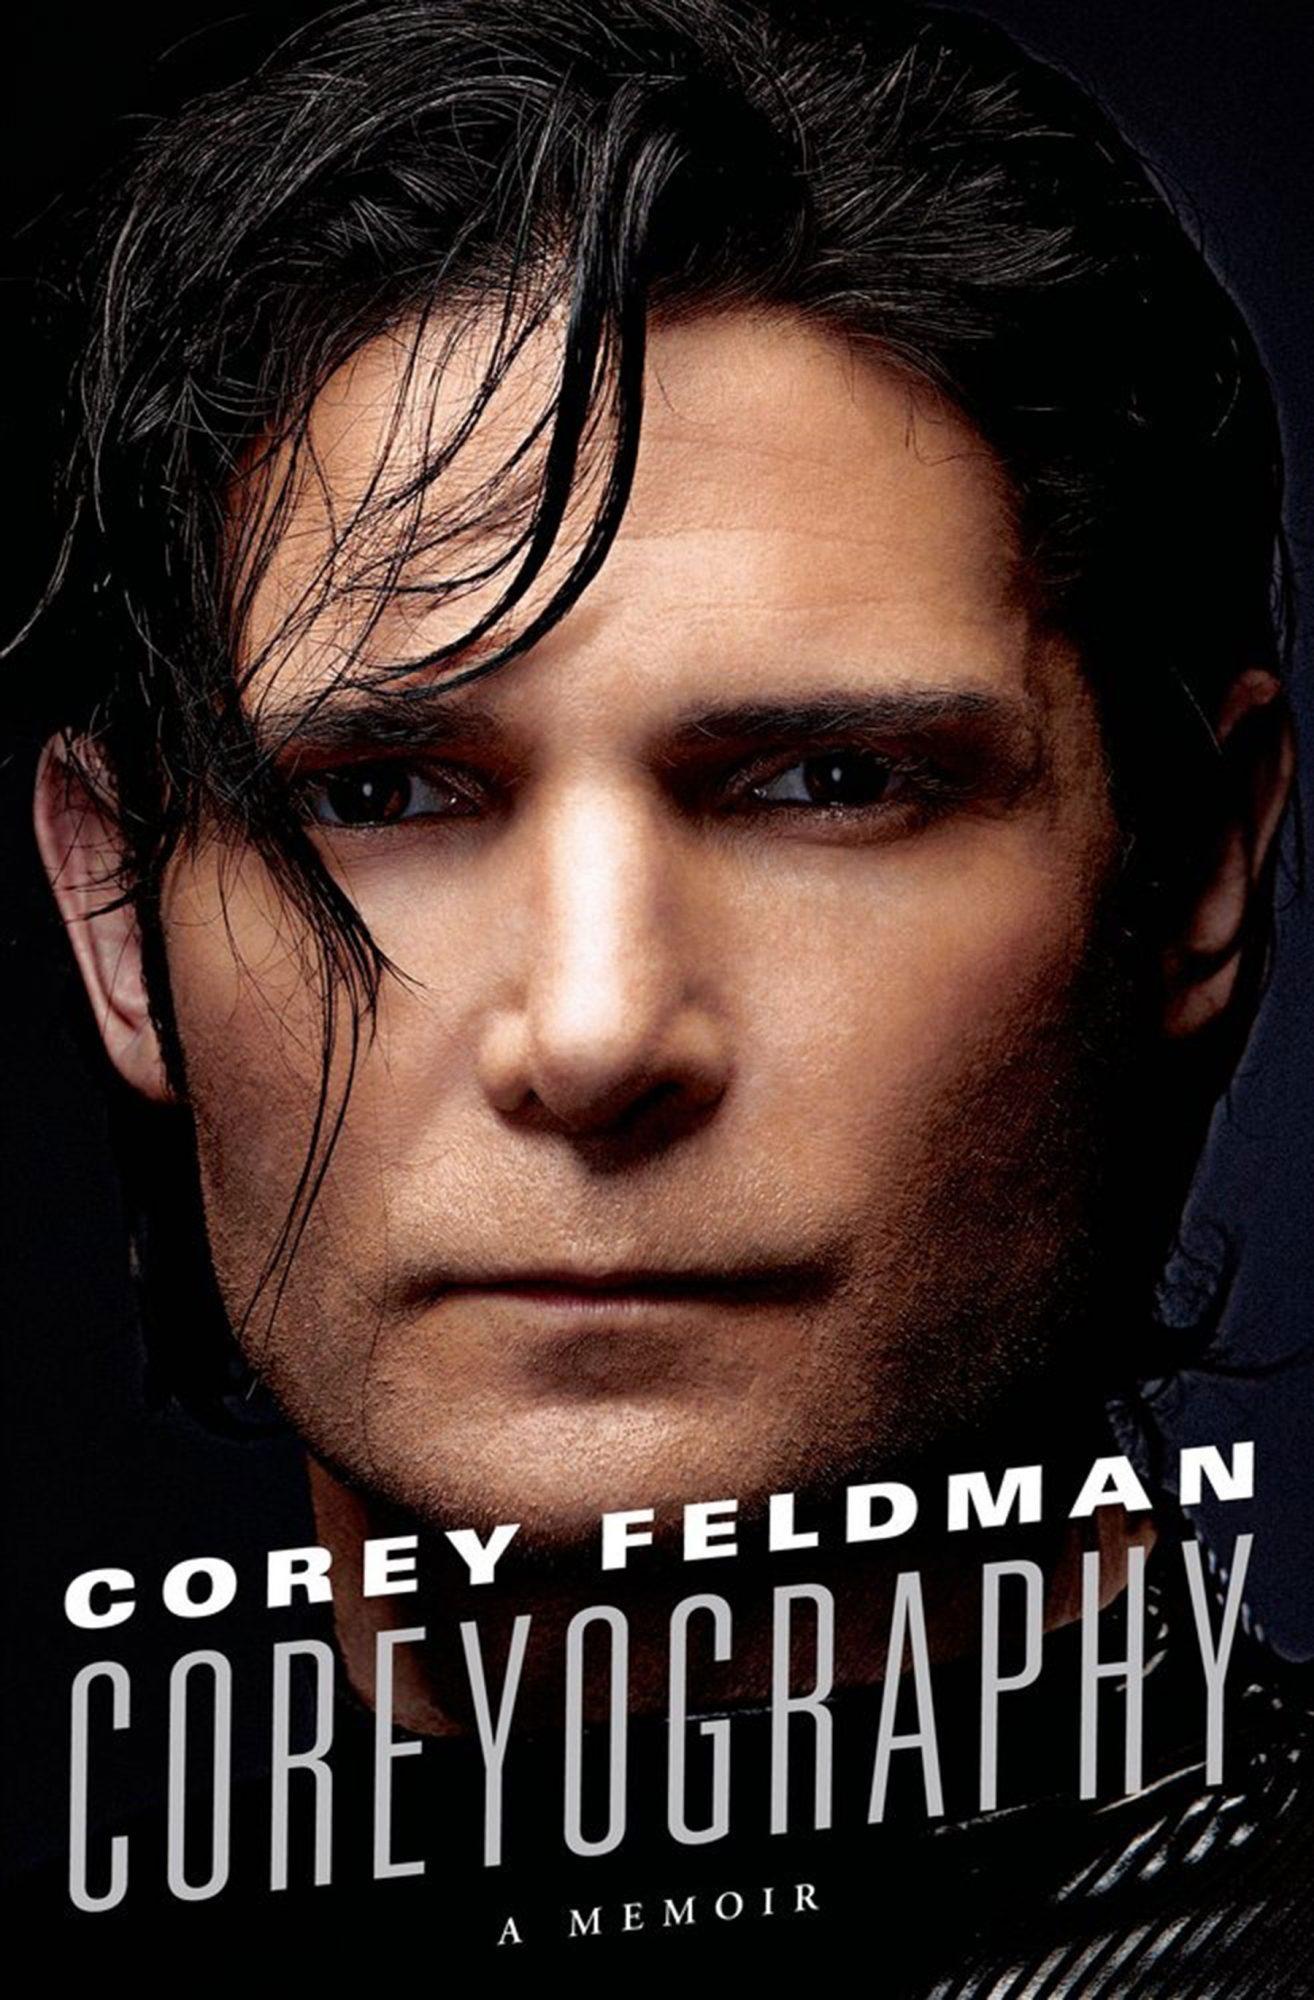 Coreyography (10/29/13)by Corey Feldman